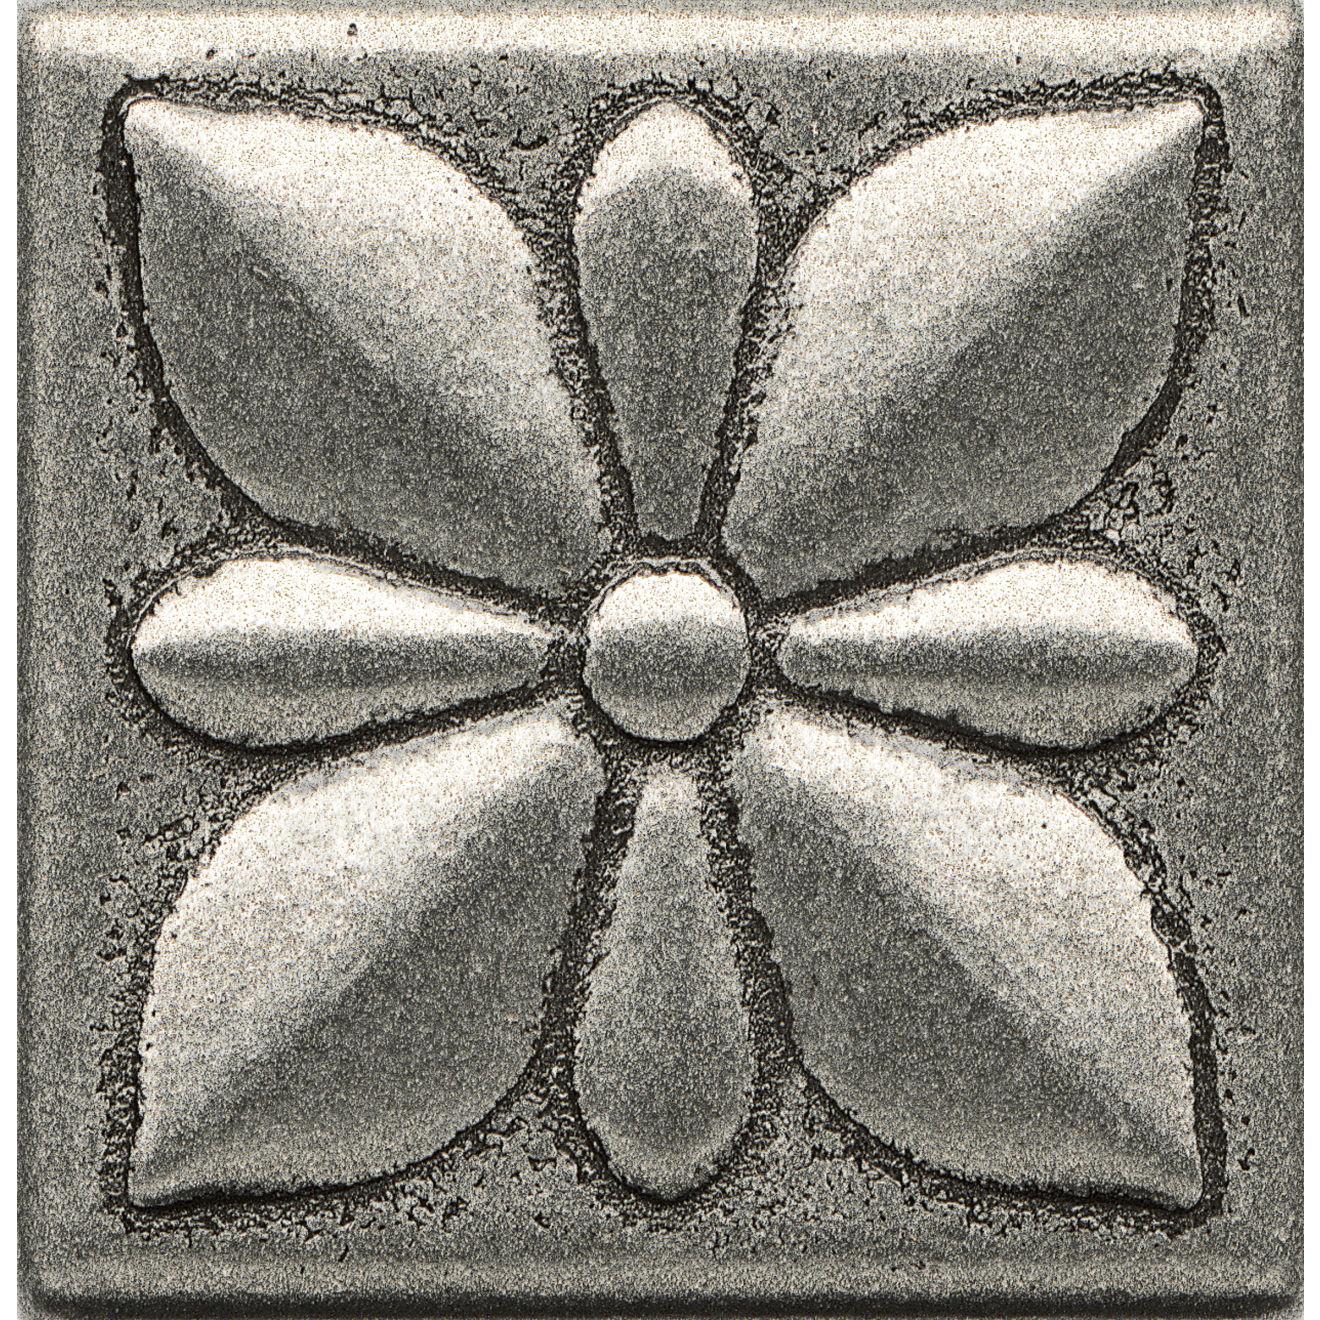 "Ambiance 2"" x 2"" Jasmine Flower Metal Resin Insert in Pewter"